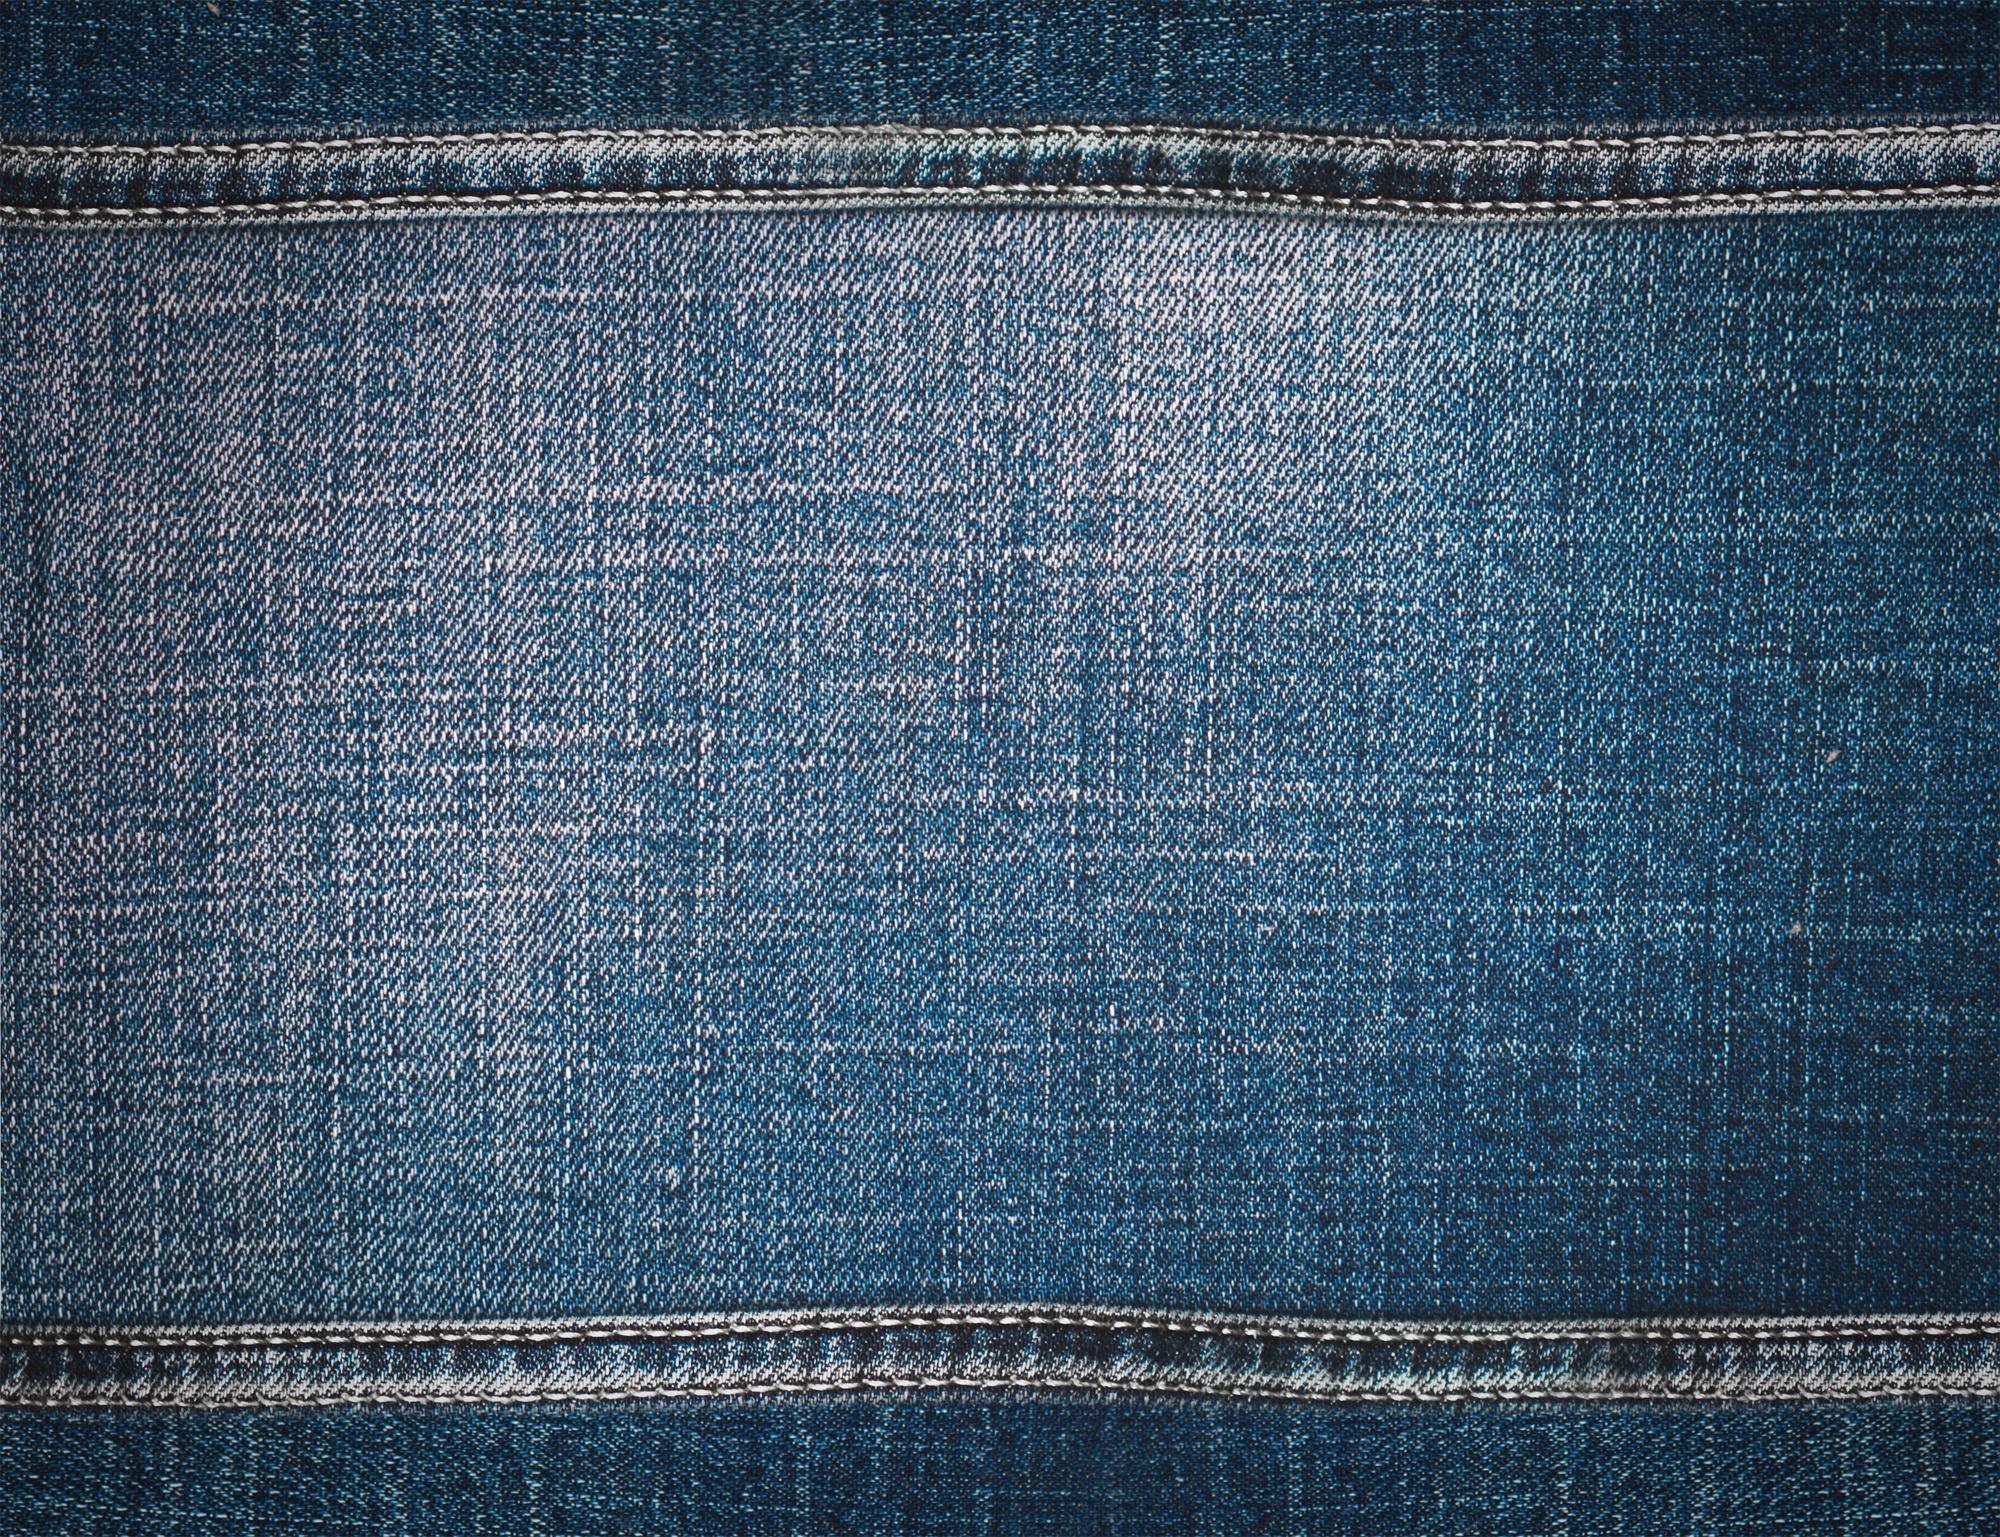 тип дизайн джинс картинки удалить фото